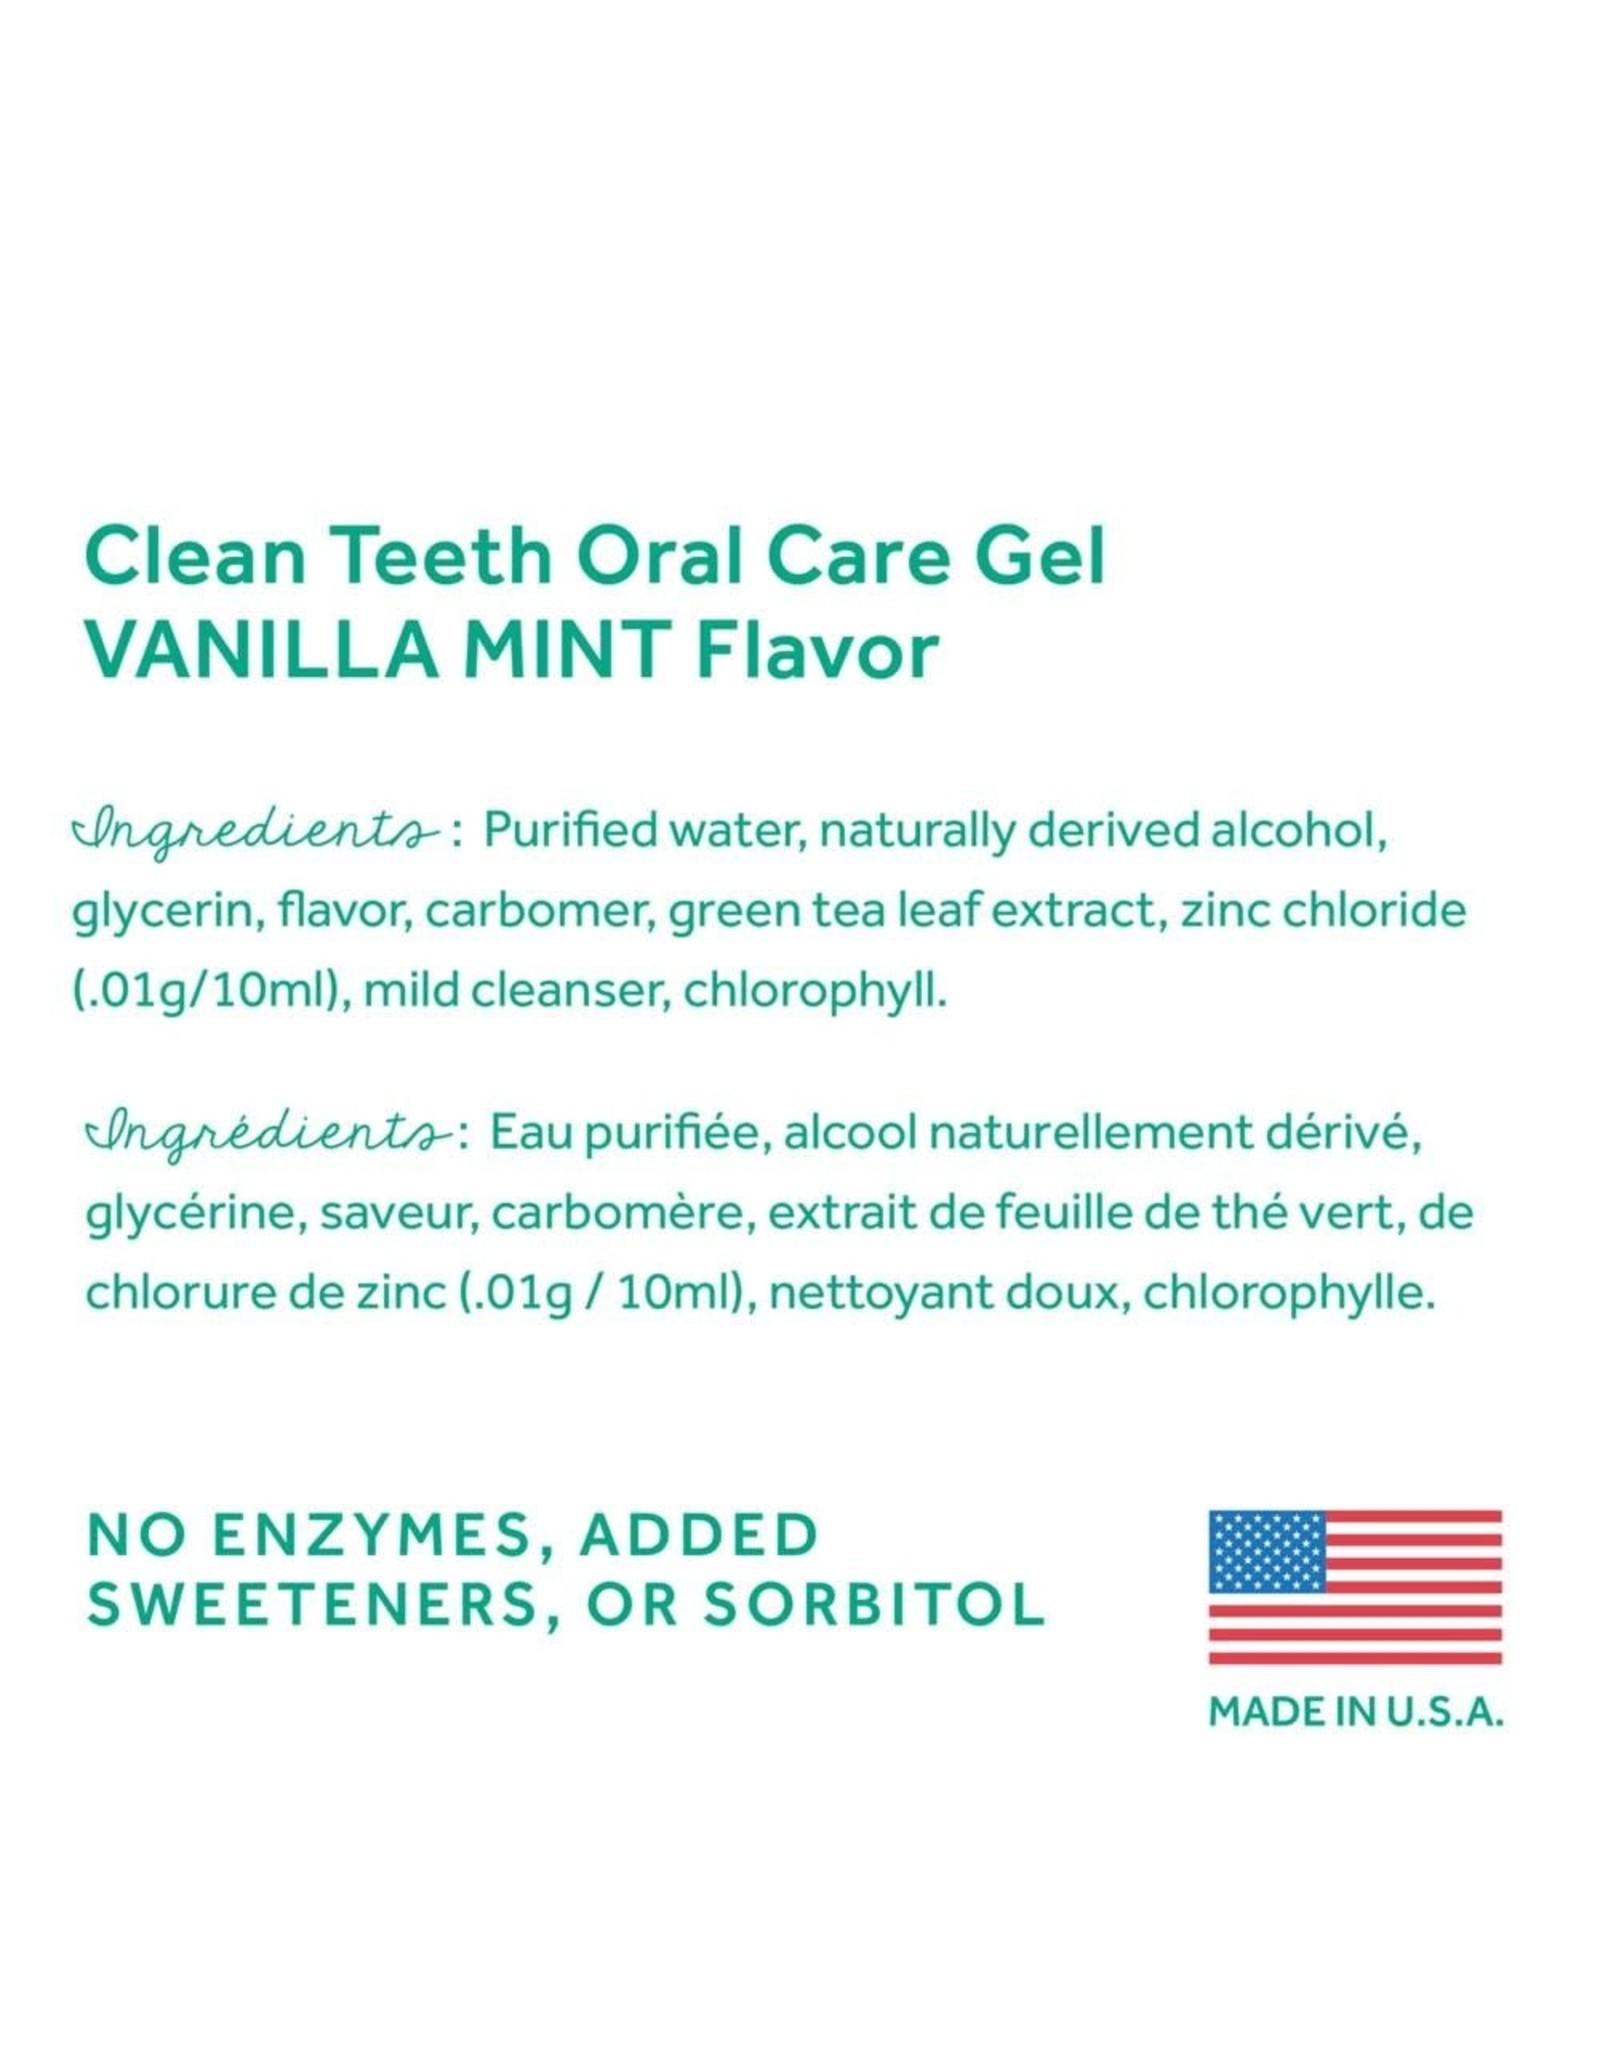 Tropiclean Tropiclean Fresh Breath No Brushing Clean Teeth Oral Gel Vanilla Mint 2oz